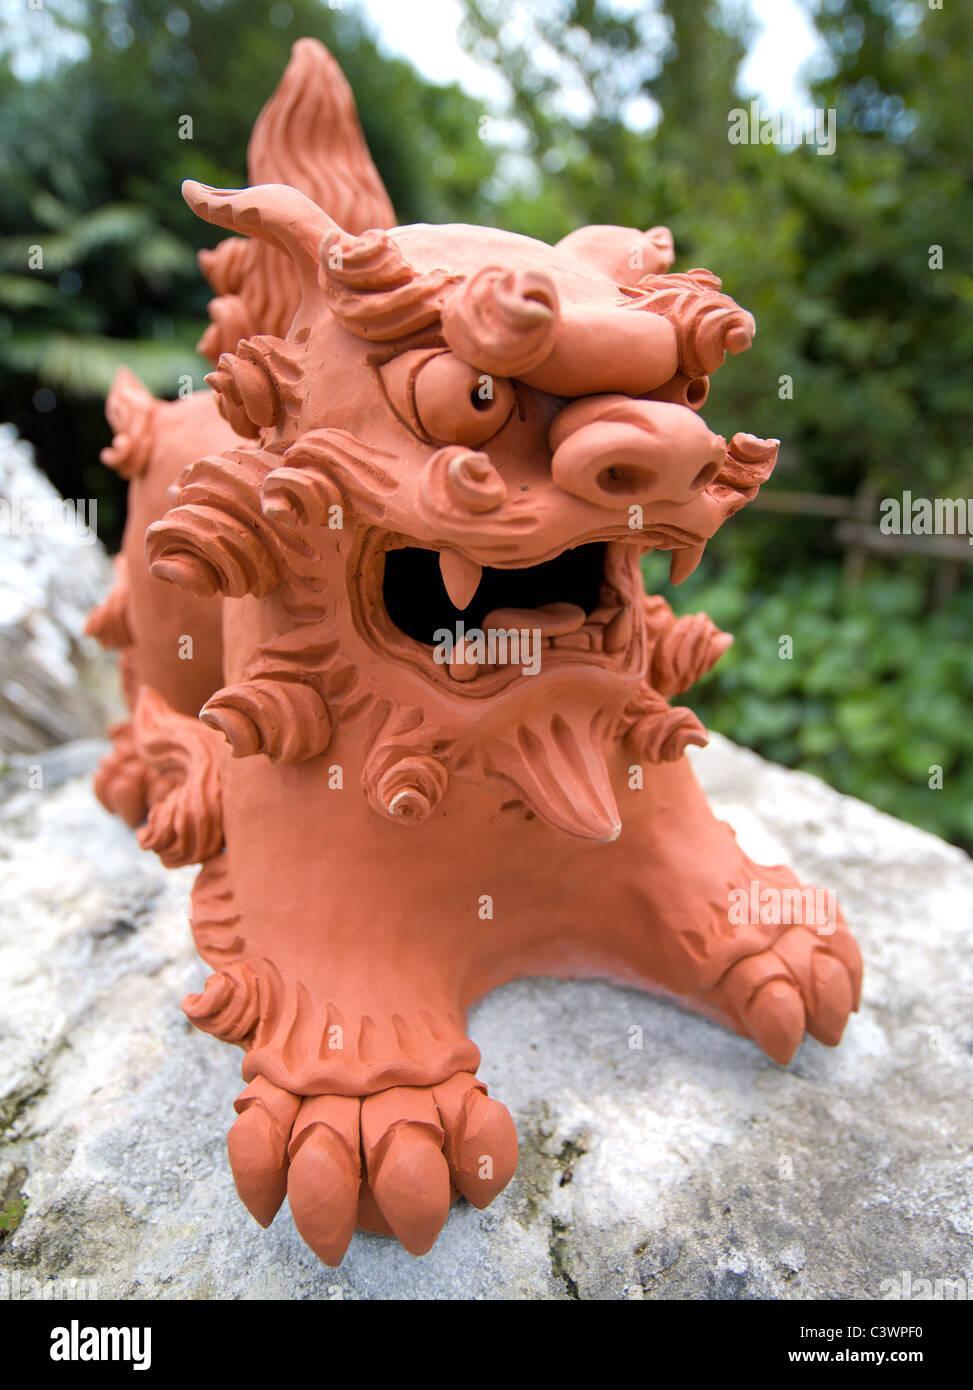 Shisa ( shishi, shisaa ) dog / lion. Traditional Okinawan talisman at Ryukyu Mura, Okinawa, Japan - Stock Image